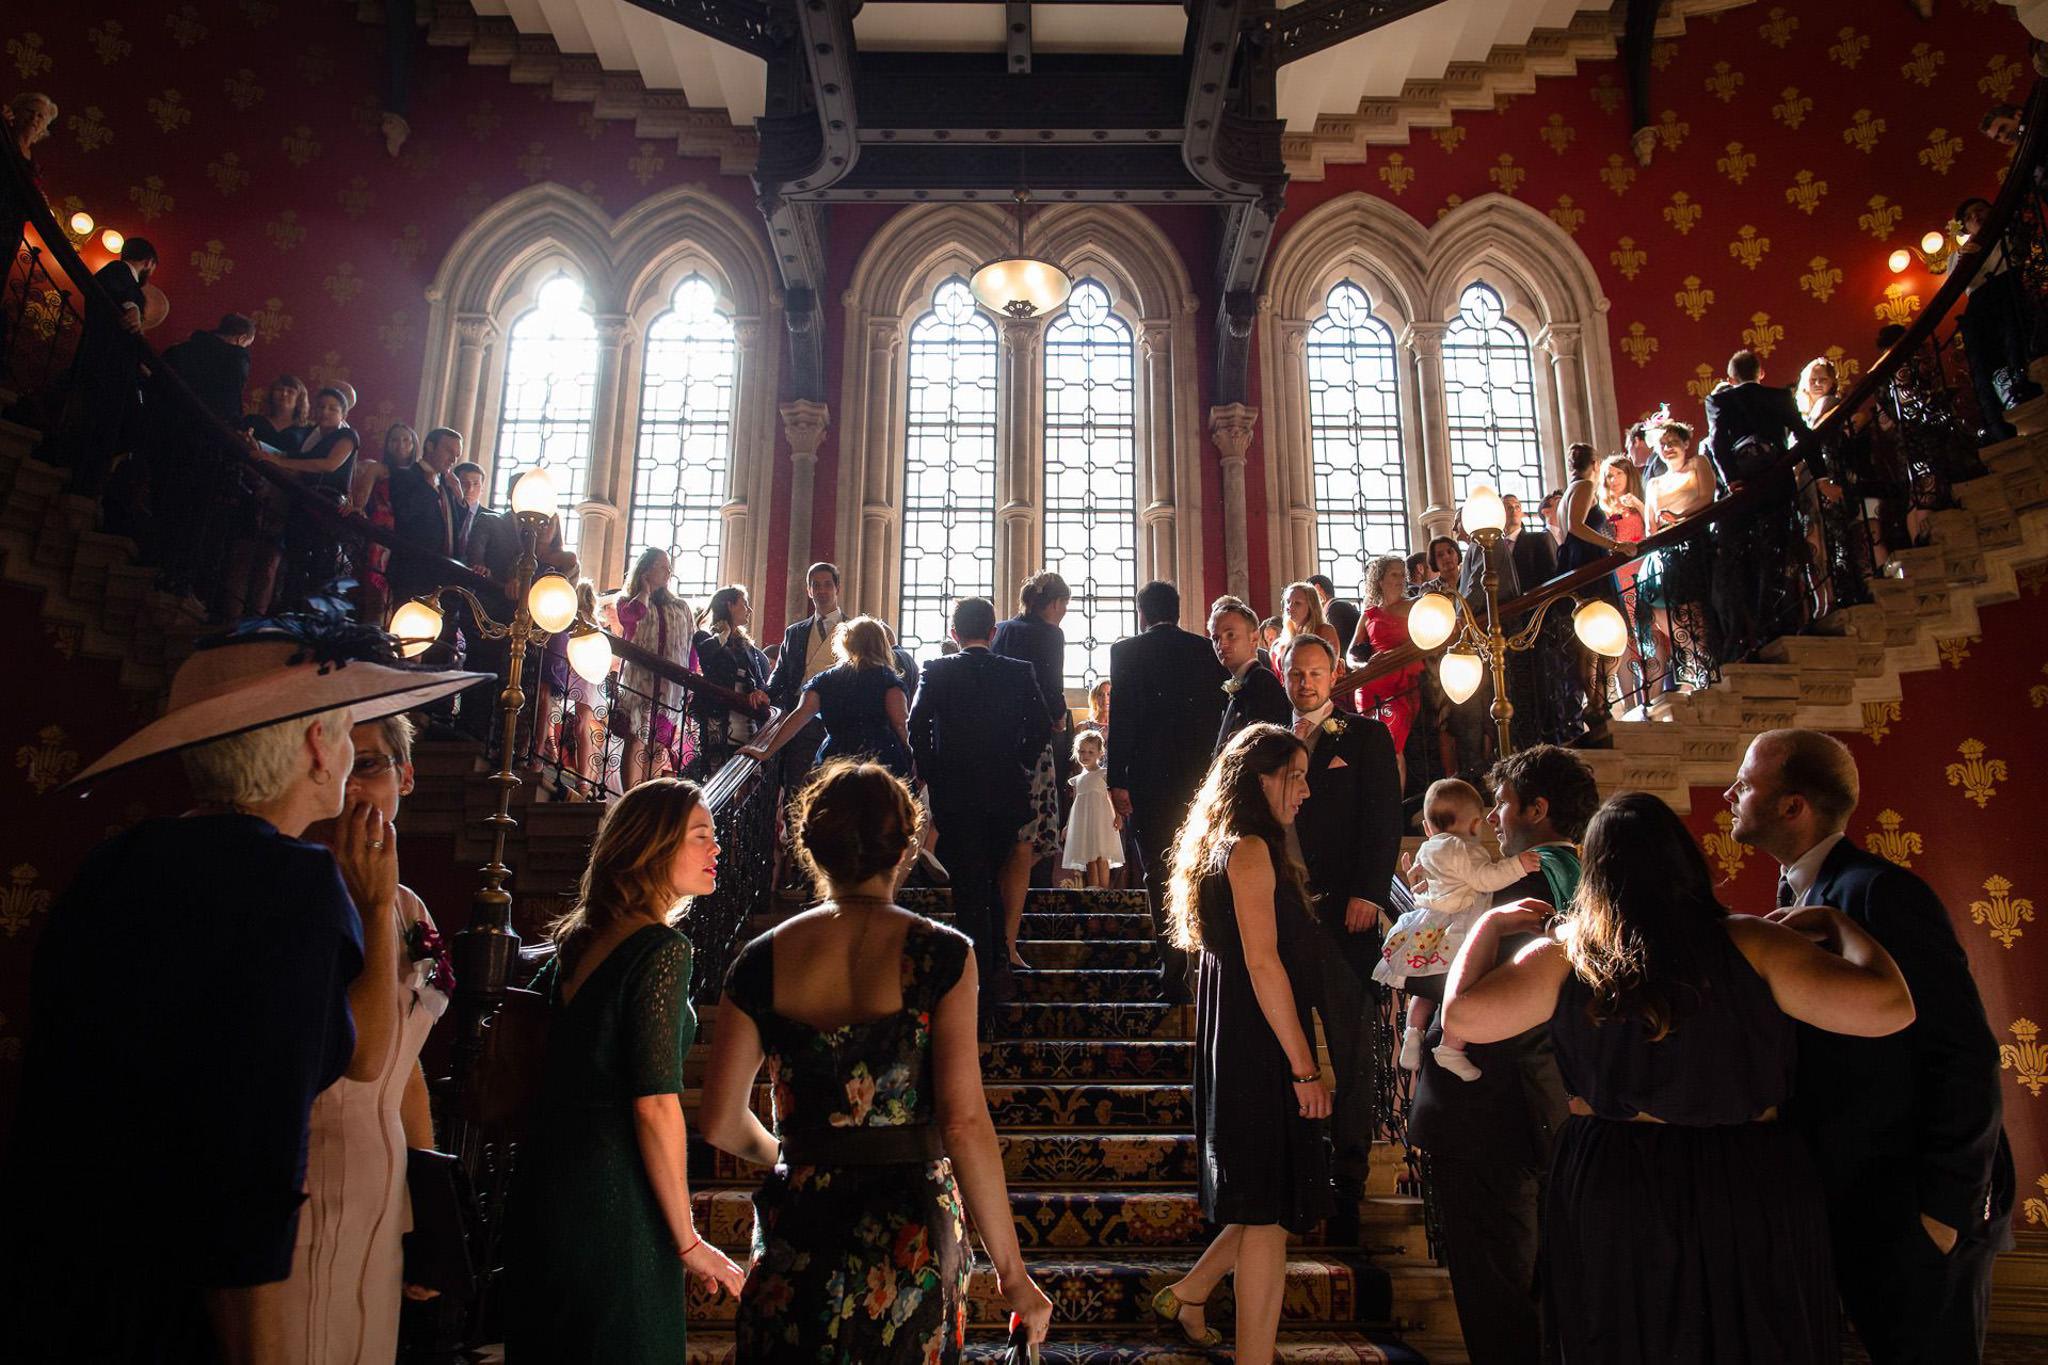 St. Pancras hotel wedding the staircase